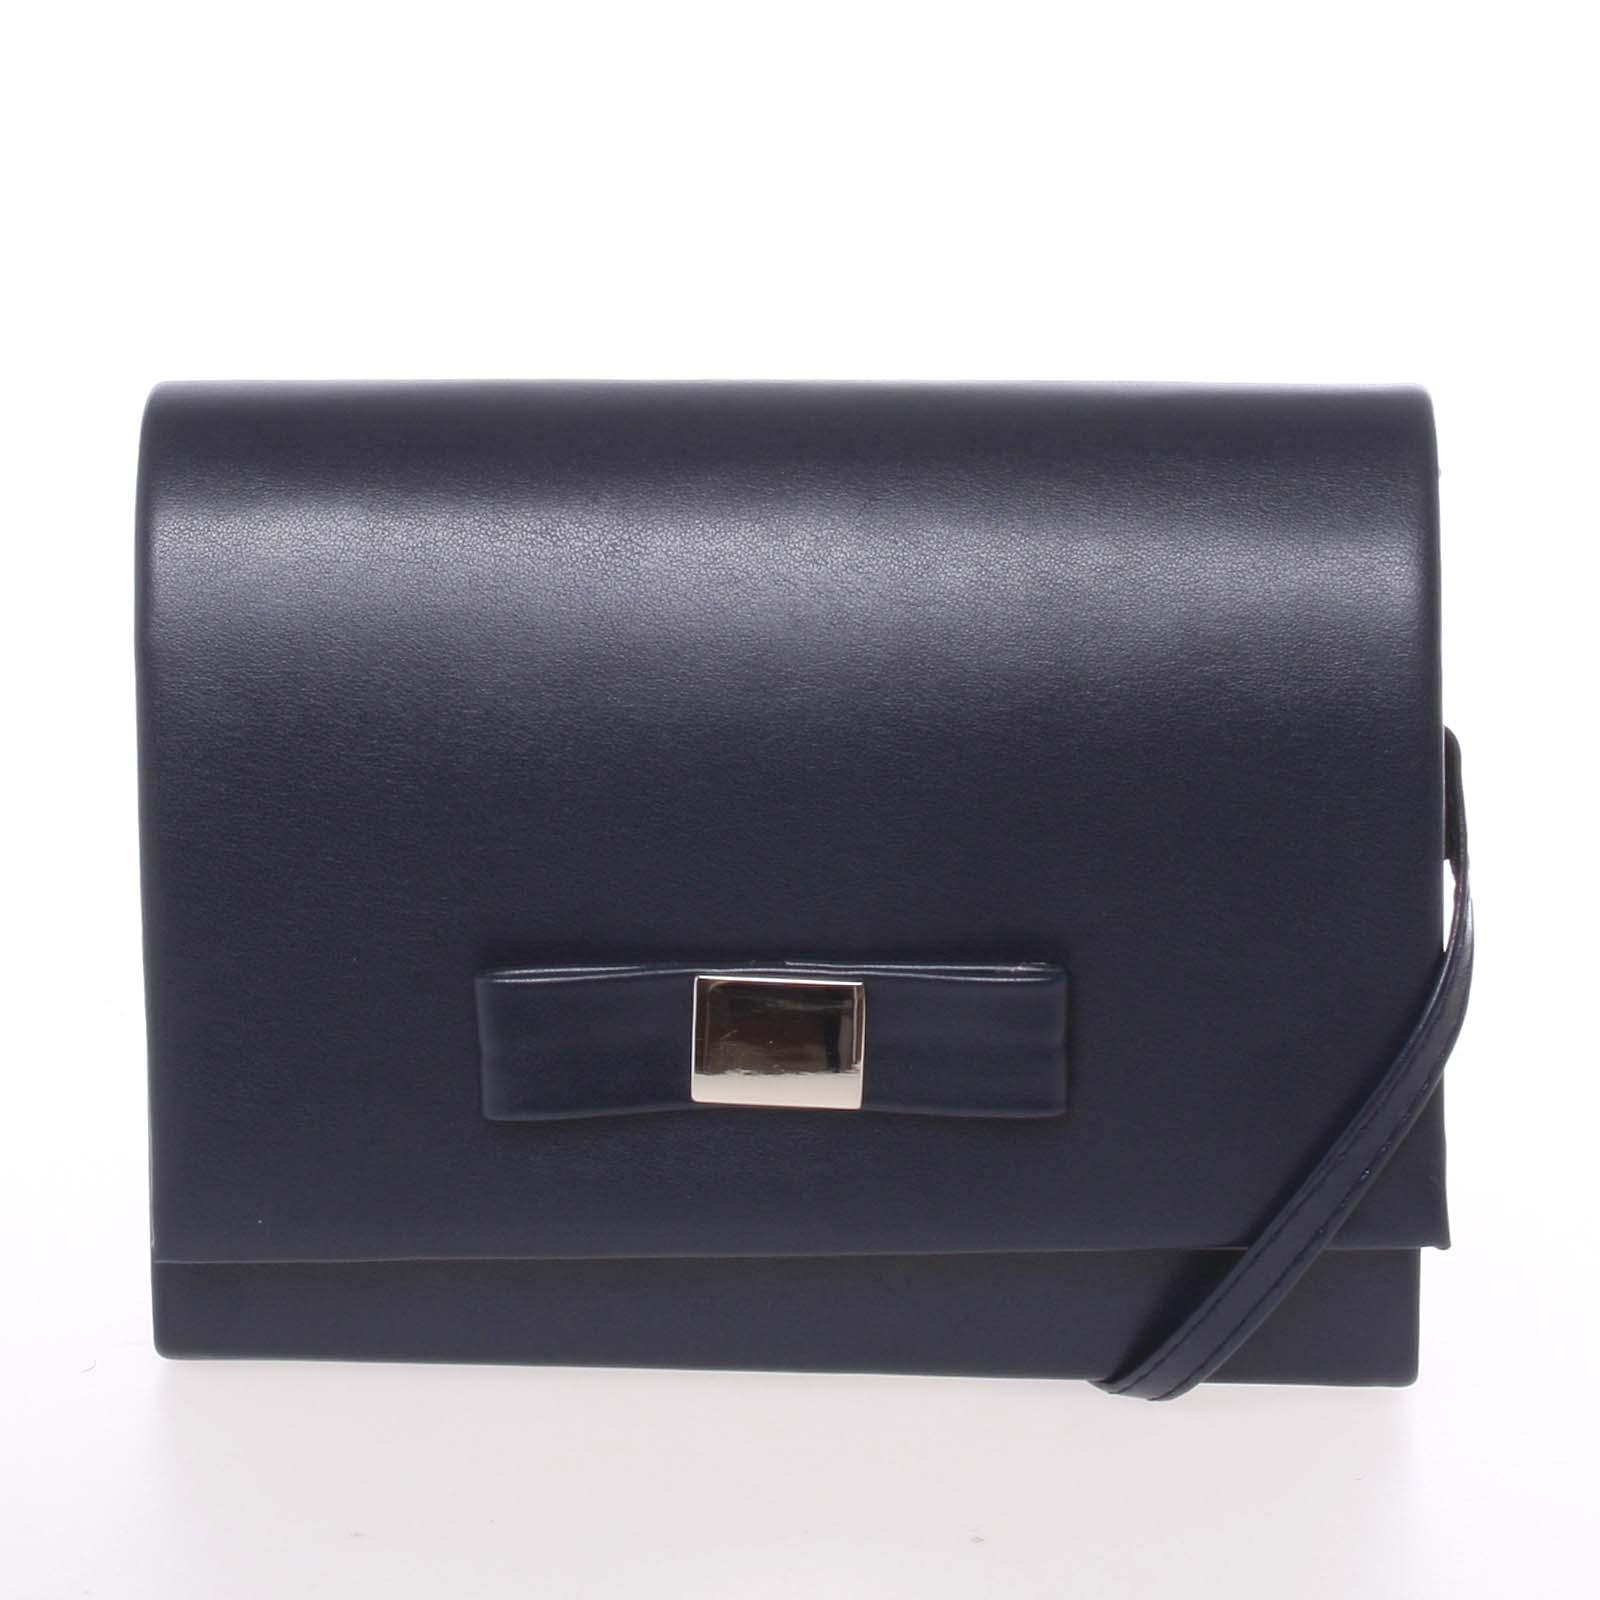 Luxusná dámska listová kabelka tmavomodrá matná - Delami Chicago Fresno